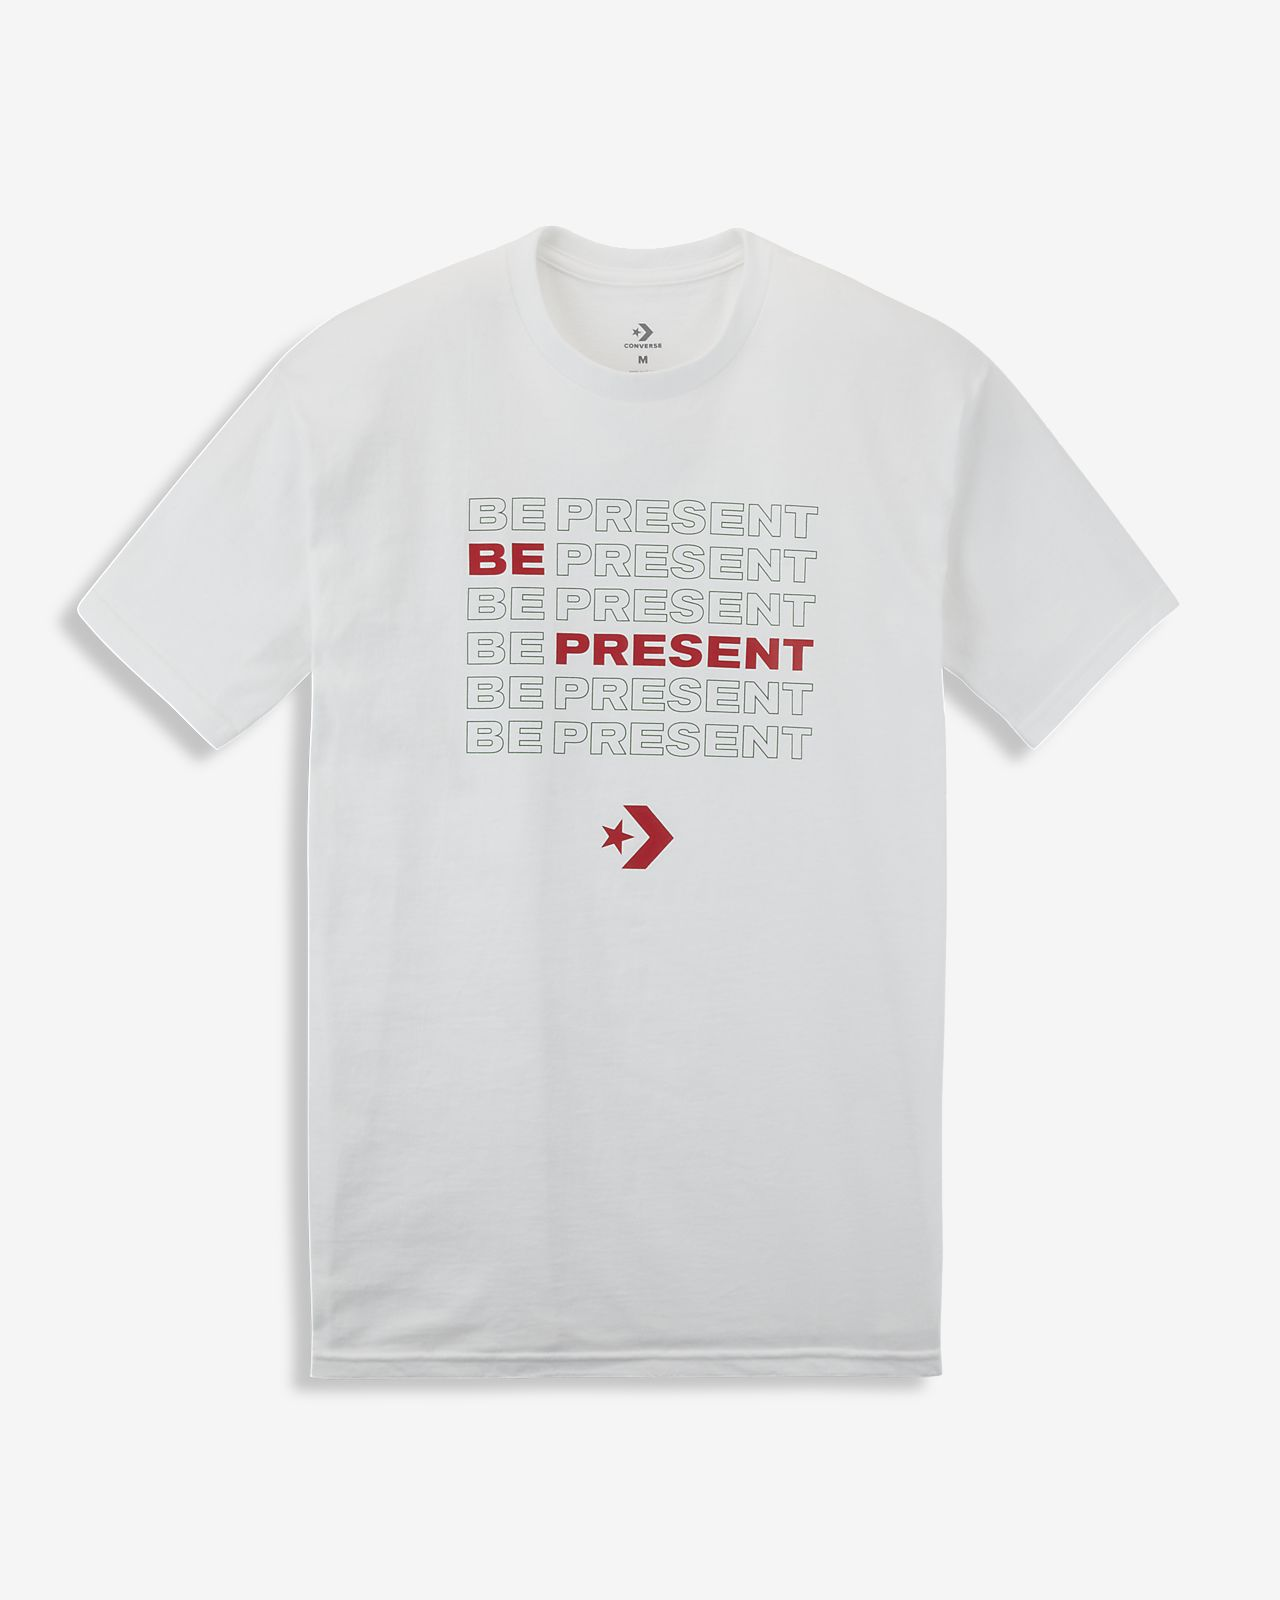 Converse Be Present Unisex T-Shirt